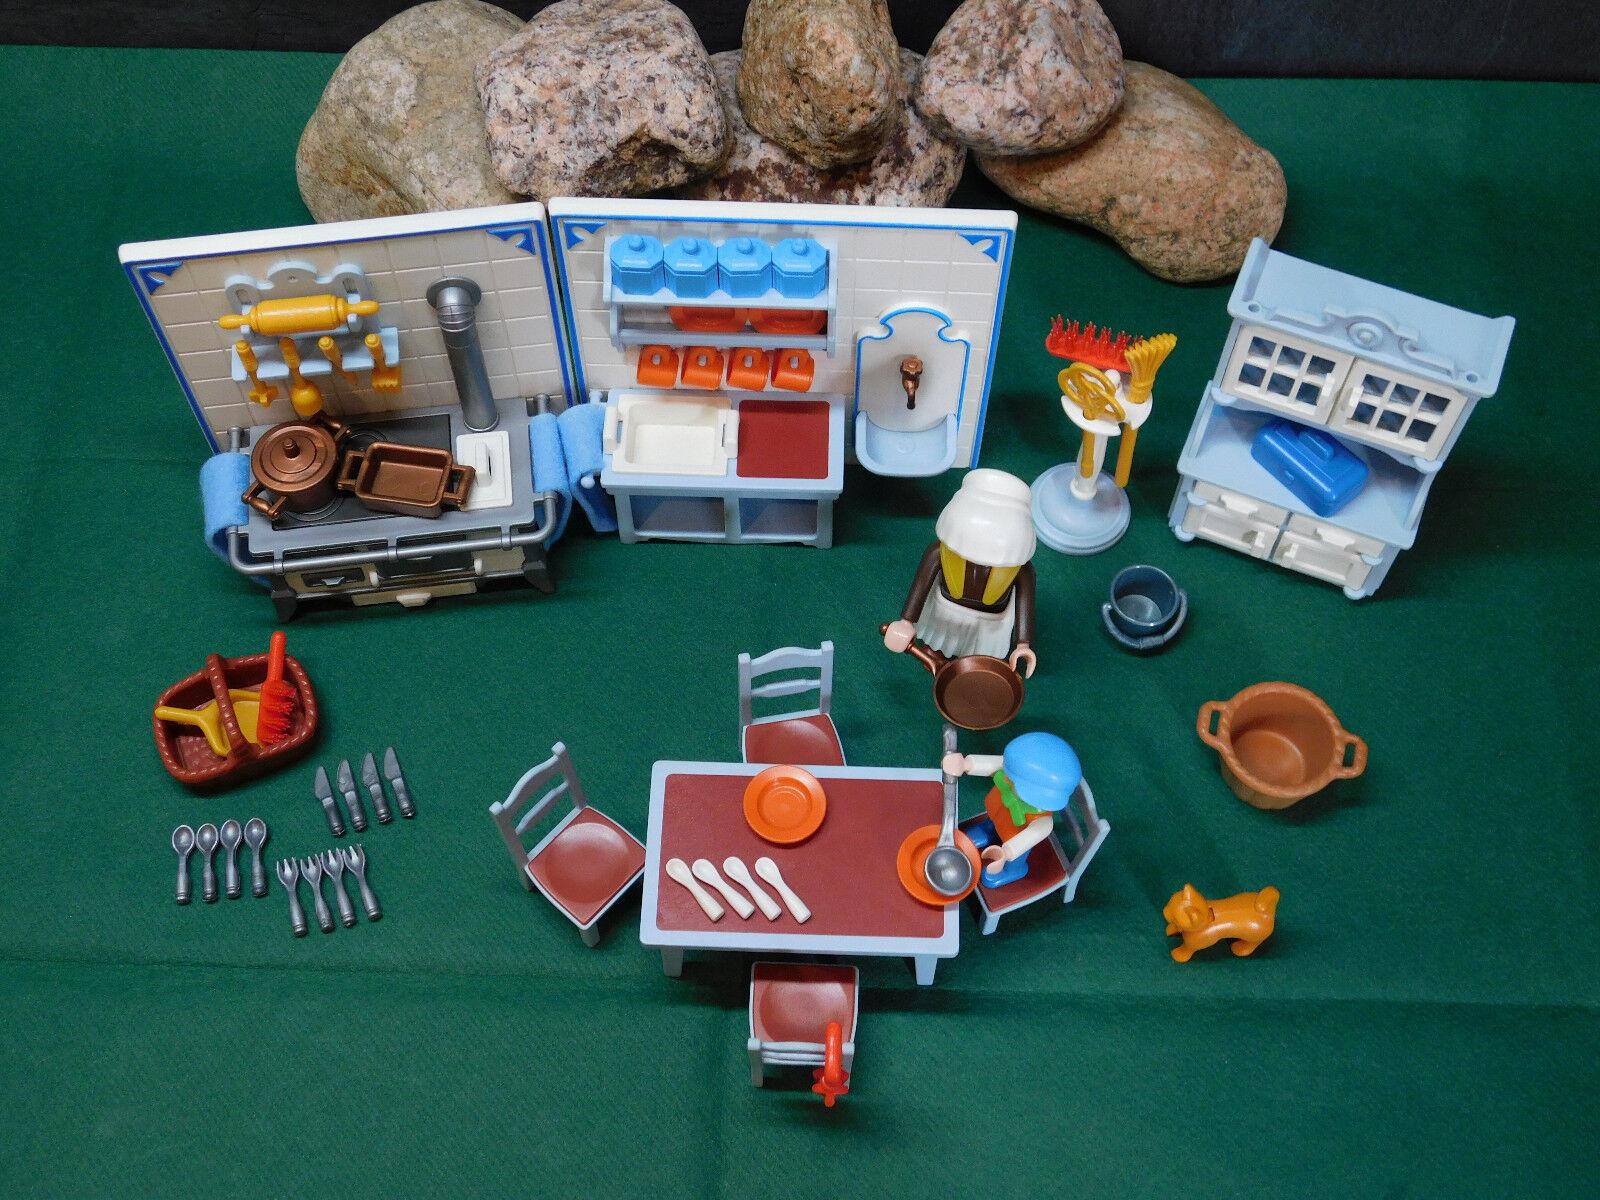 Playmobil Rarität Nostalgie Rosa Serie Küche 5322-A 1989 1989 1989 ohne OVP 125558